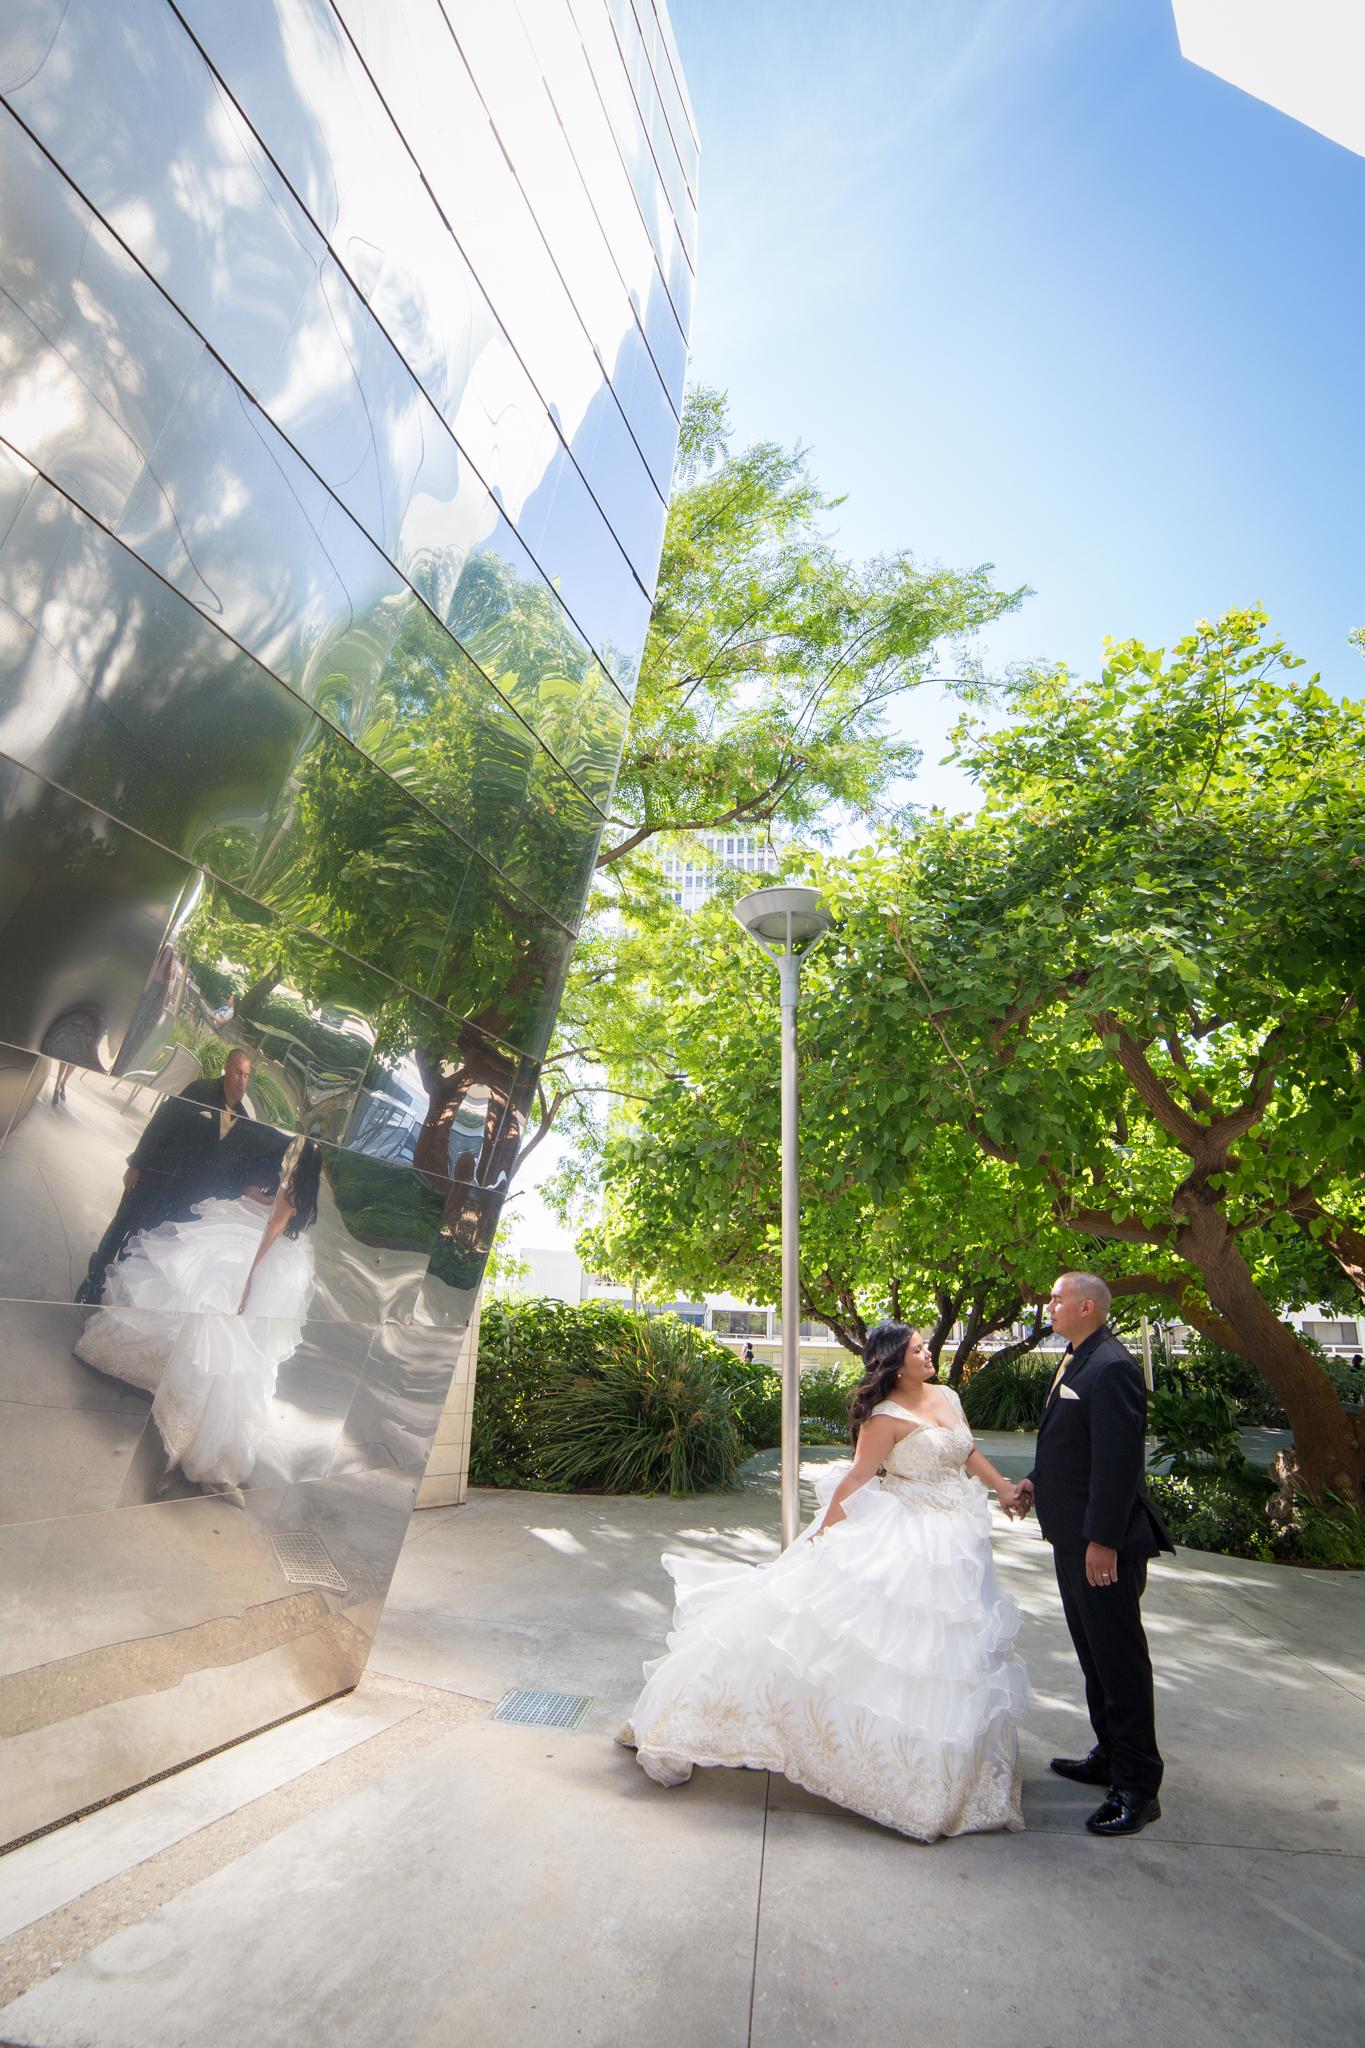 18_07JUL 21 Griselda's Wedding-0947.jpg